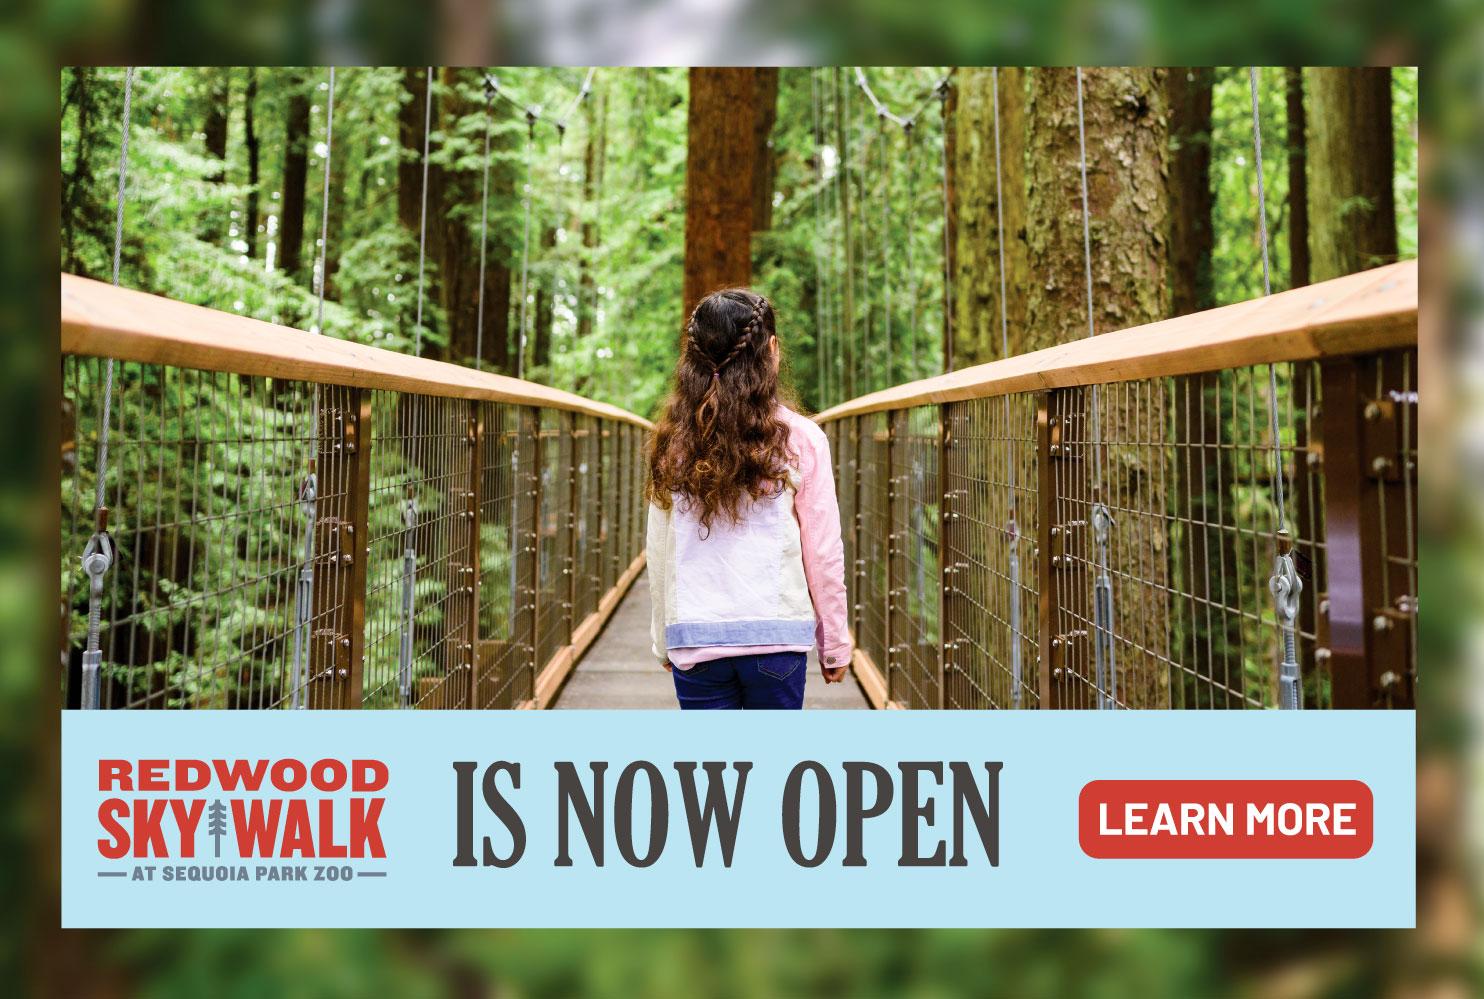 Redwood Sky Walk is now open. Click to leave Sequoia Park Zoo website and visit the Redwood Sky Walk website.